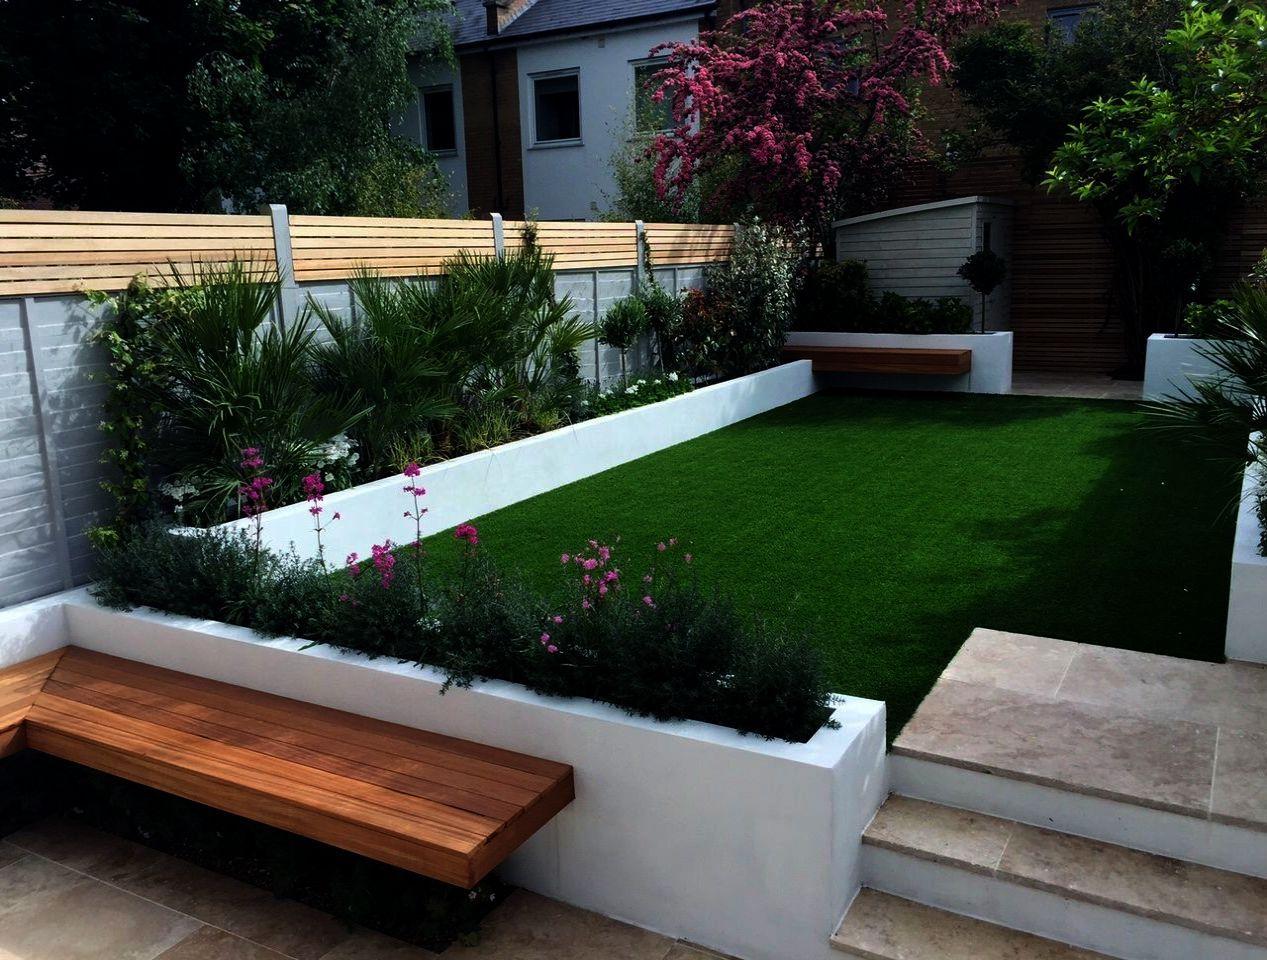 Outland Design Landscape Architecture Since Garden Landscape Supplies Blaxland Both La Modern Garden Landscaping Contemporary Garden Design Garden Architecture